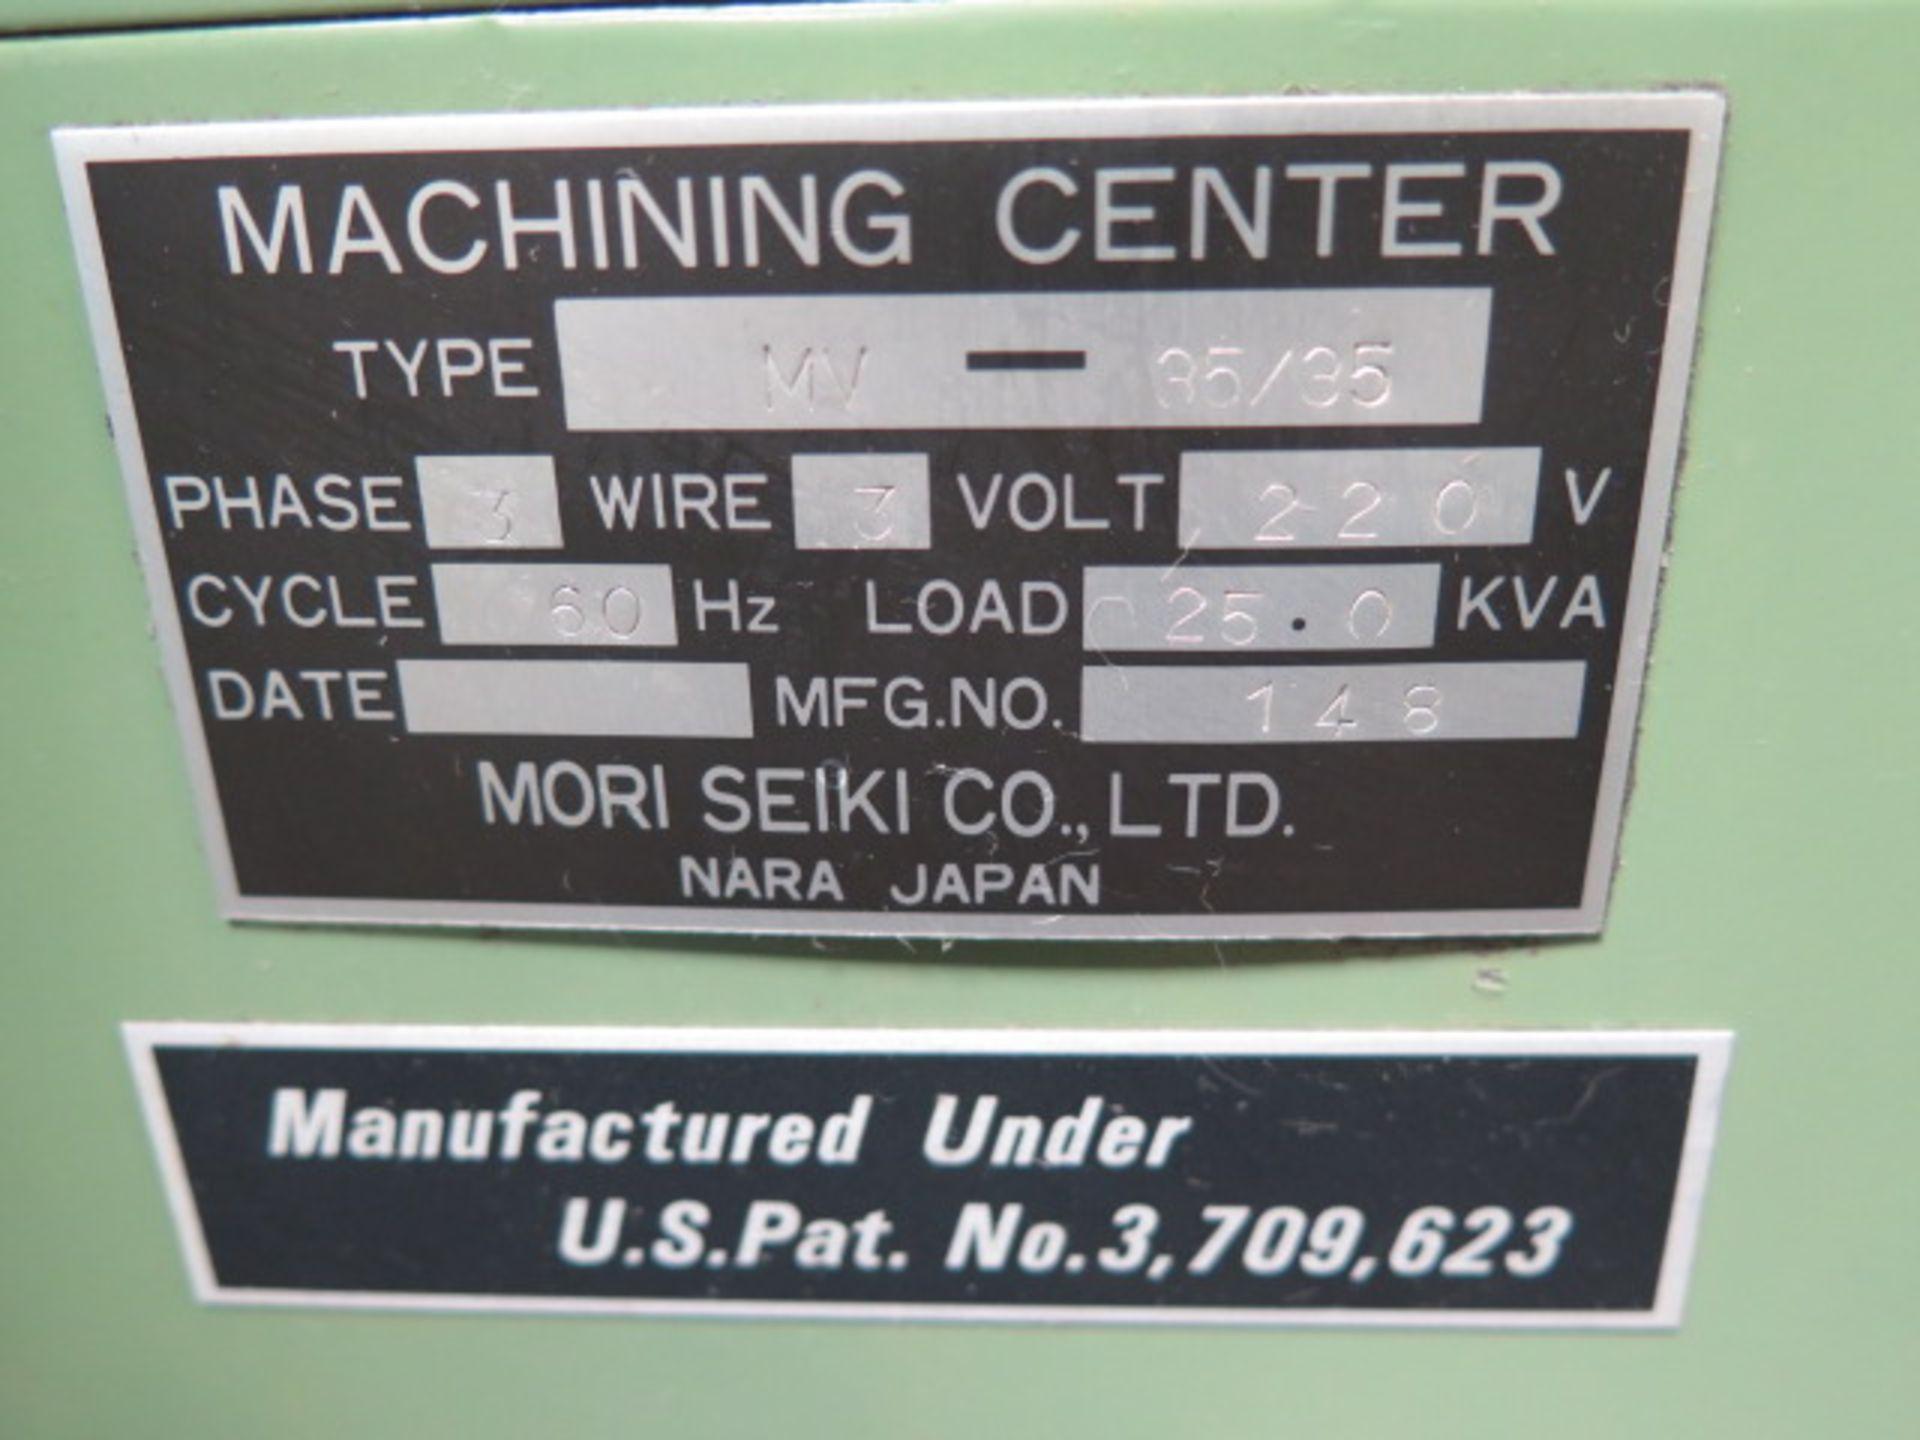 Mori Seiki MV-35/35 CNC VMC s/n 148 w/ Fanuc Controls, 20-Station ATC, BT-35, SOLD AS IS - Image 14 of 14